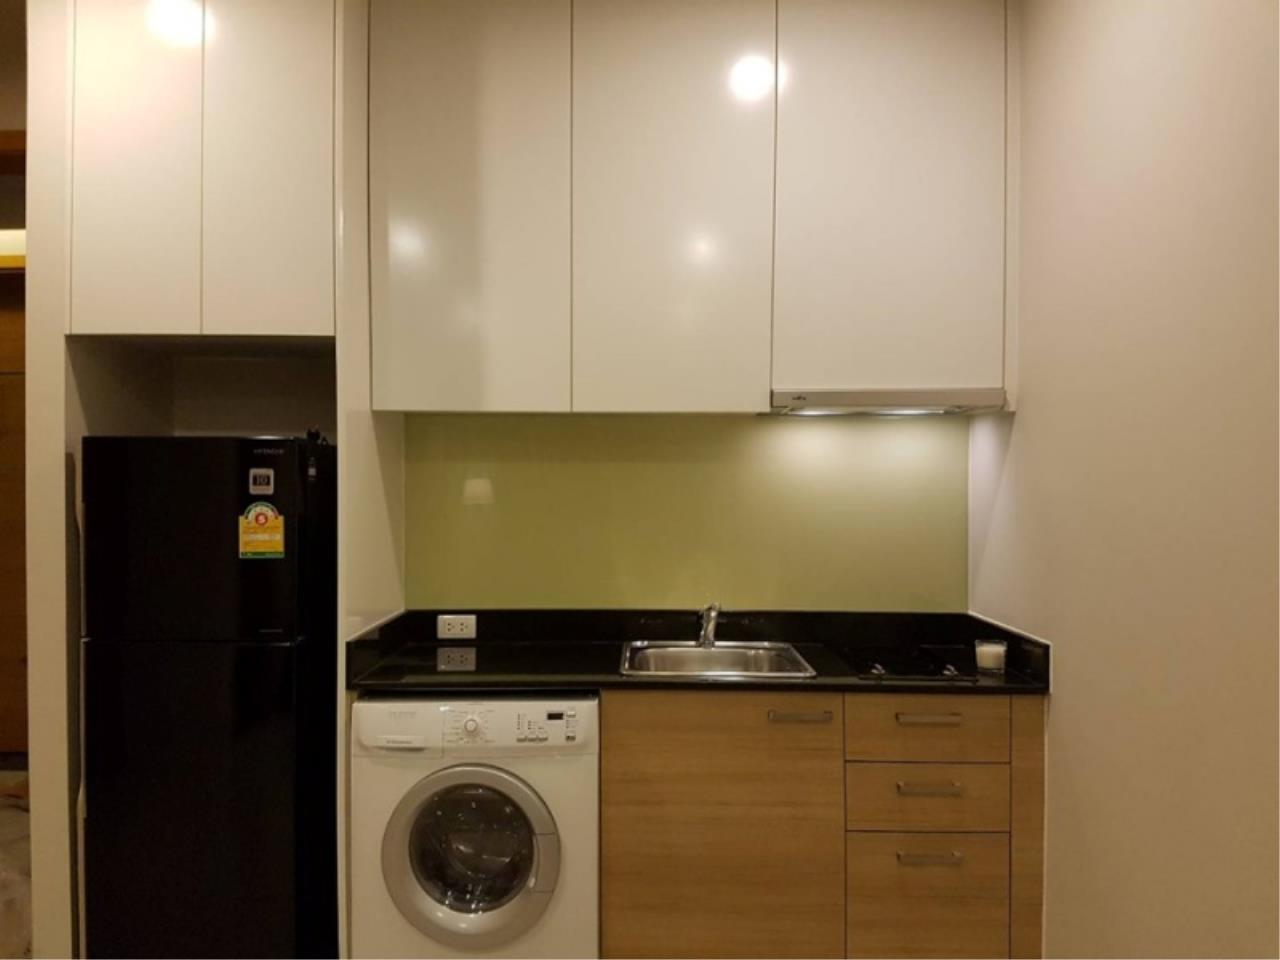 Century21 Skylux Agency's Circle Condominium / Condo For Rent / 1 Bedroom / 45 SQM / BTS Nana / Bangkok 5